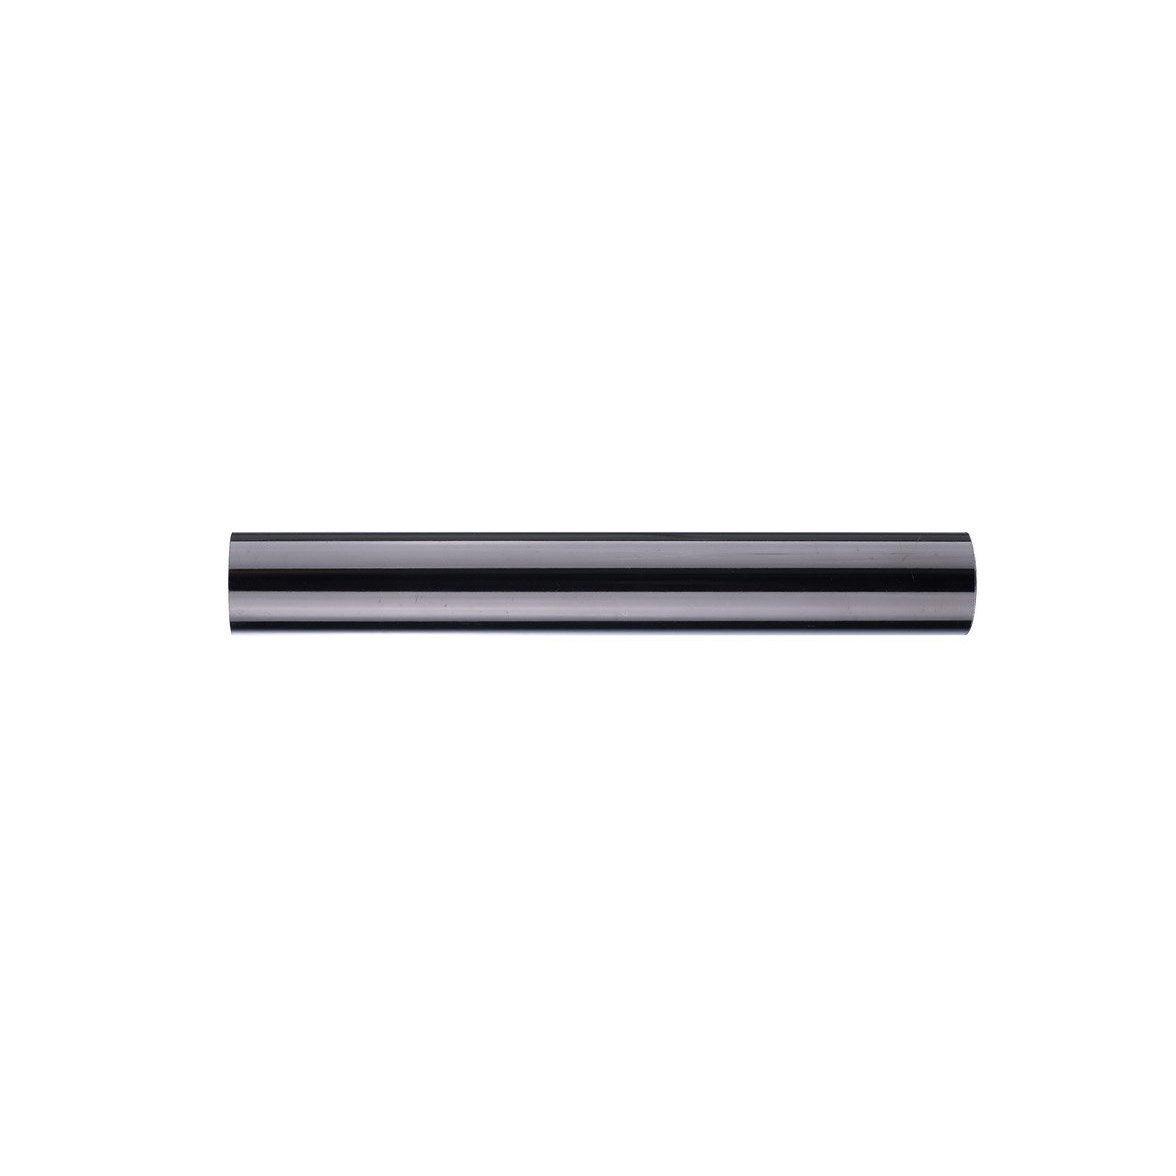 tringle rideau chic noir brillant 250 cm inspire leroy merlin. Black Bedroom Furniture Sets. Home Design Ideas